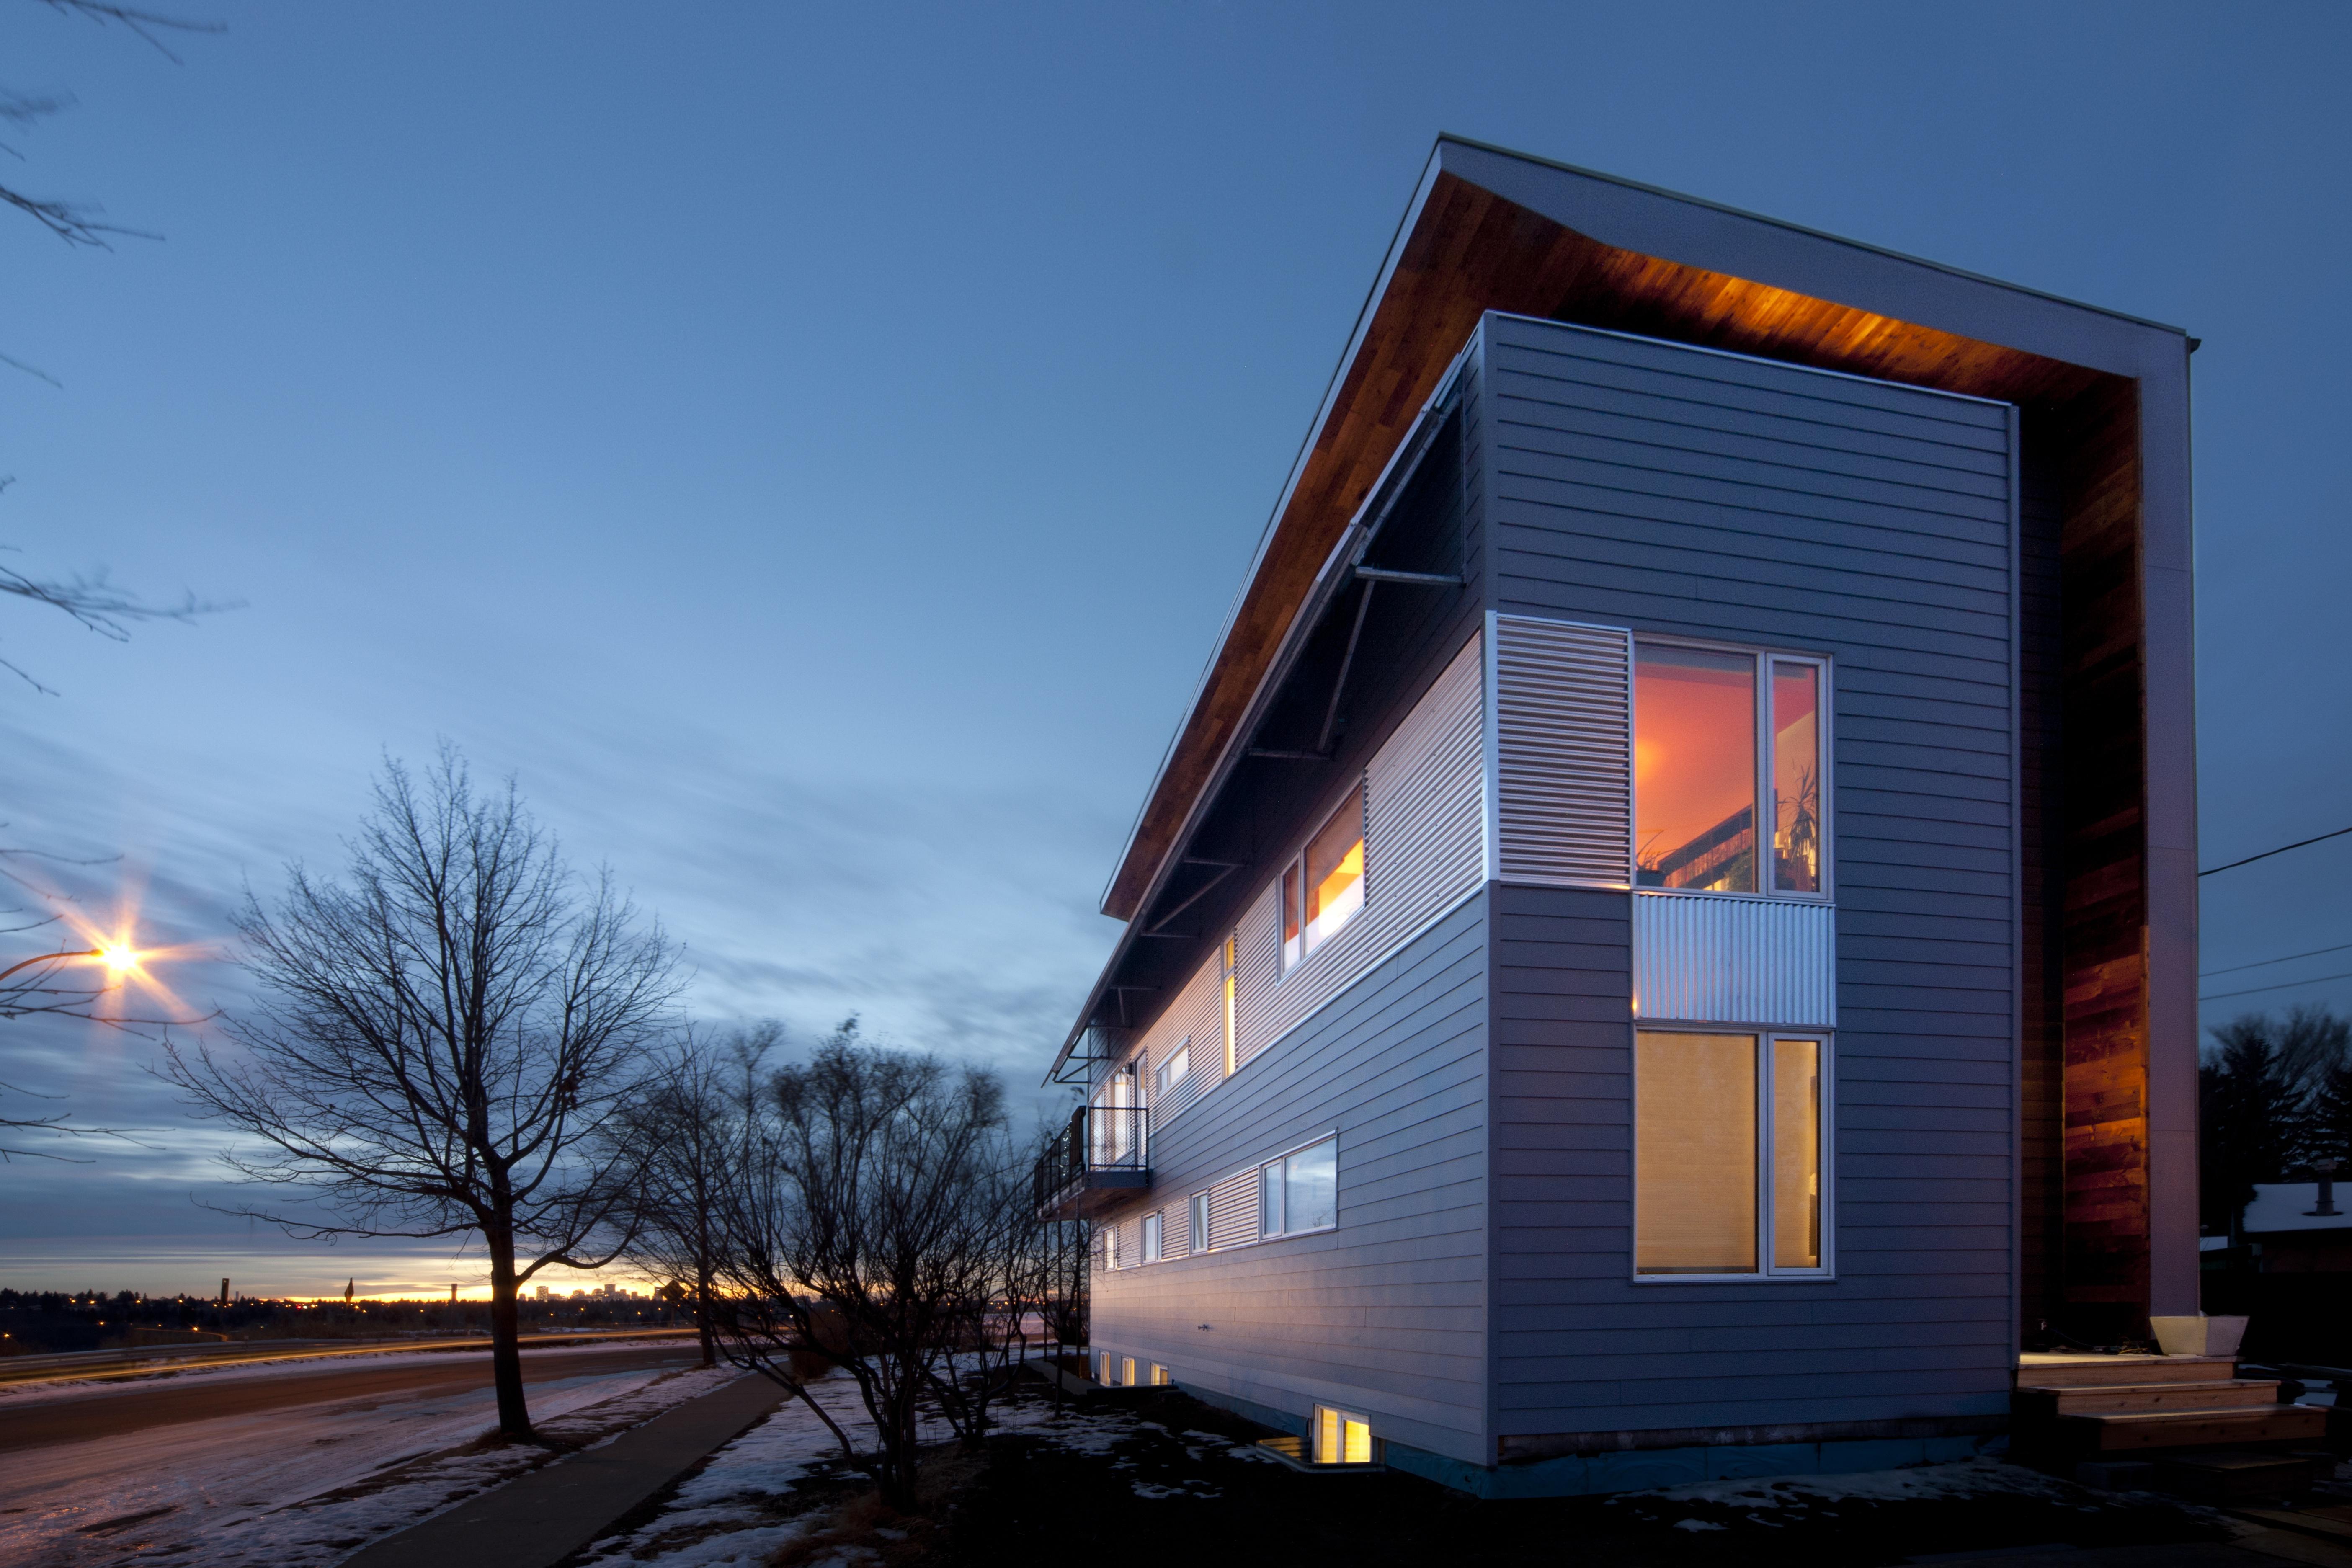 Edificio a energia quasi zero